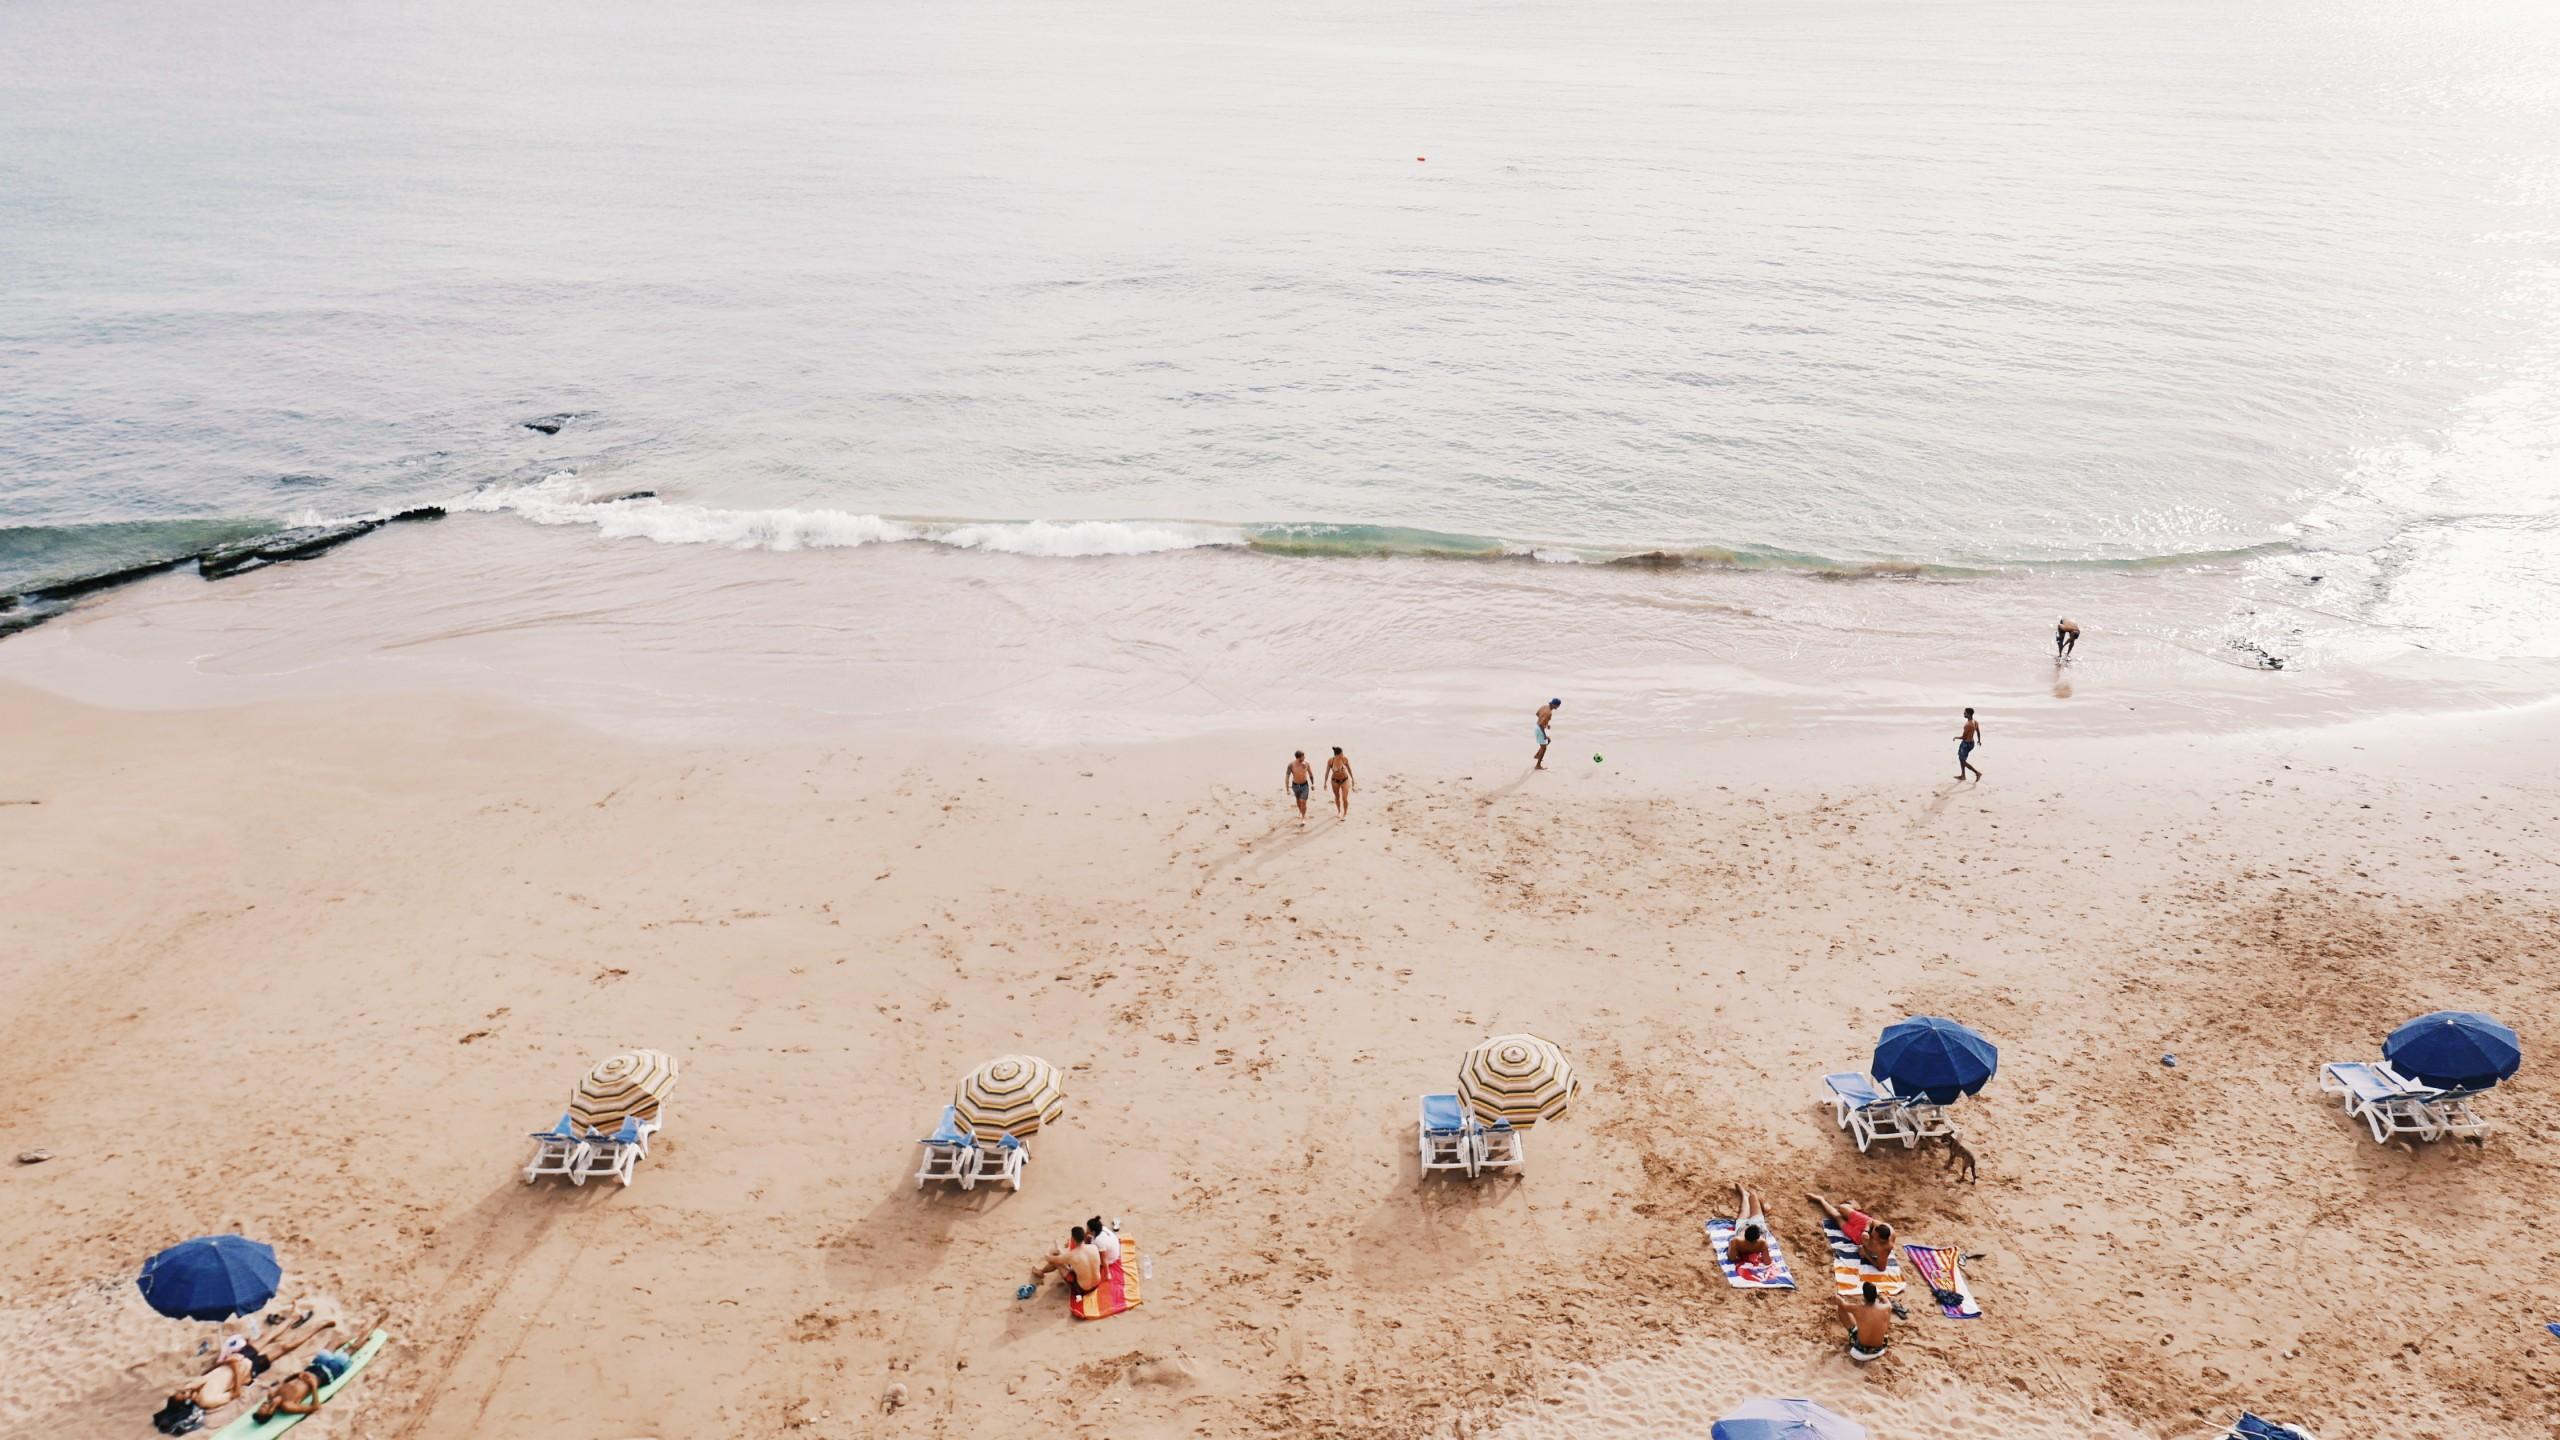 Taghazout Beach Surf Maroc Summer